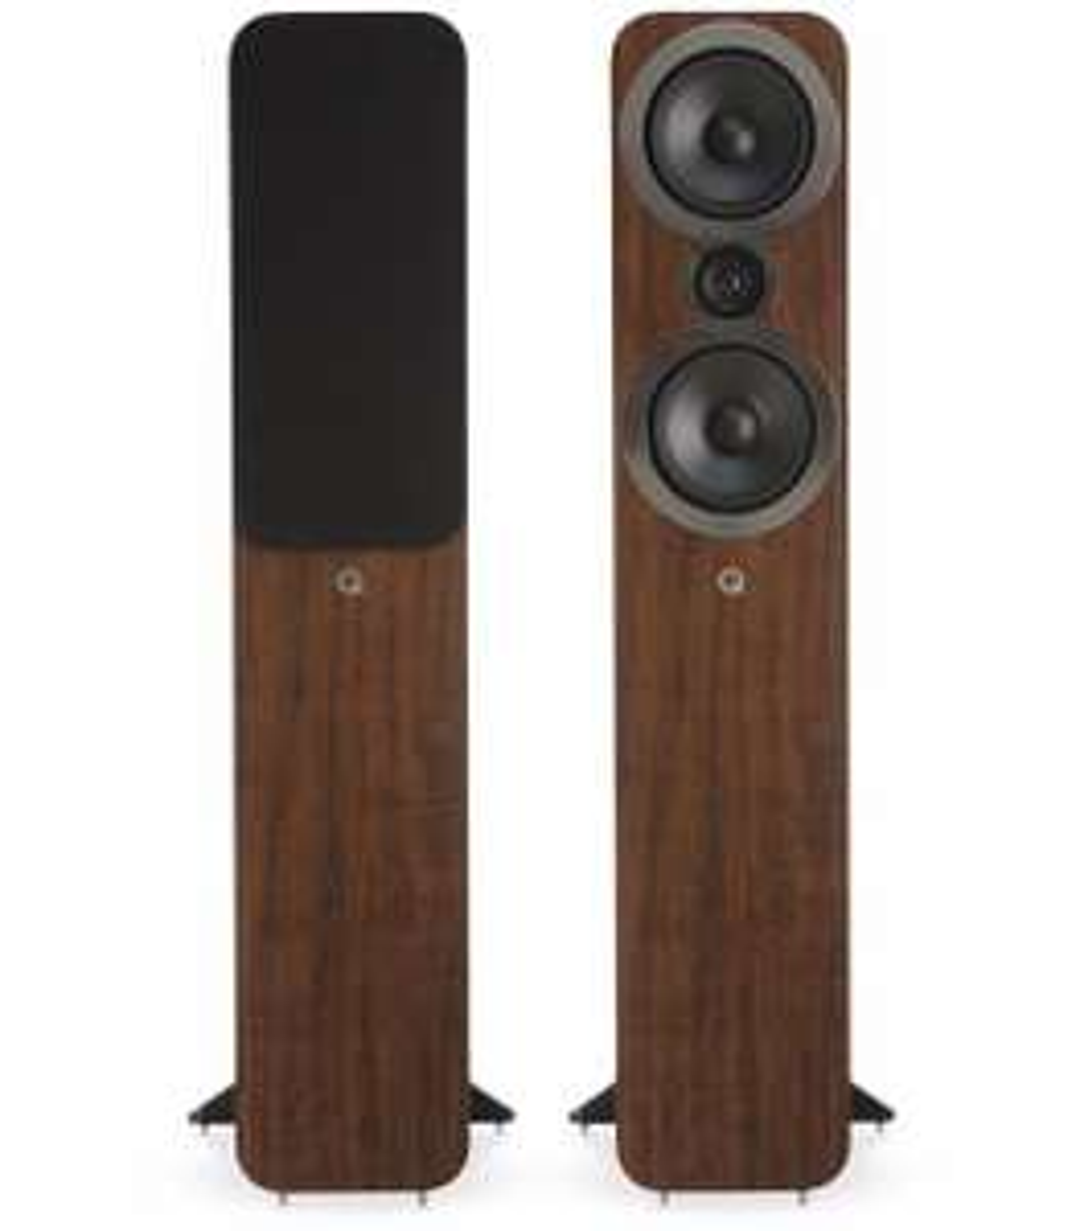 Q Acoustics 3050i pair of speakers £320 delivered (walnut colour) at Q Acoustics